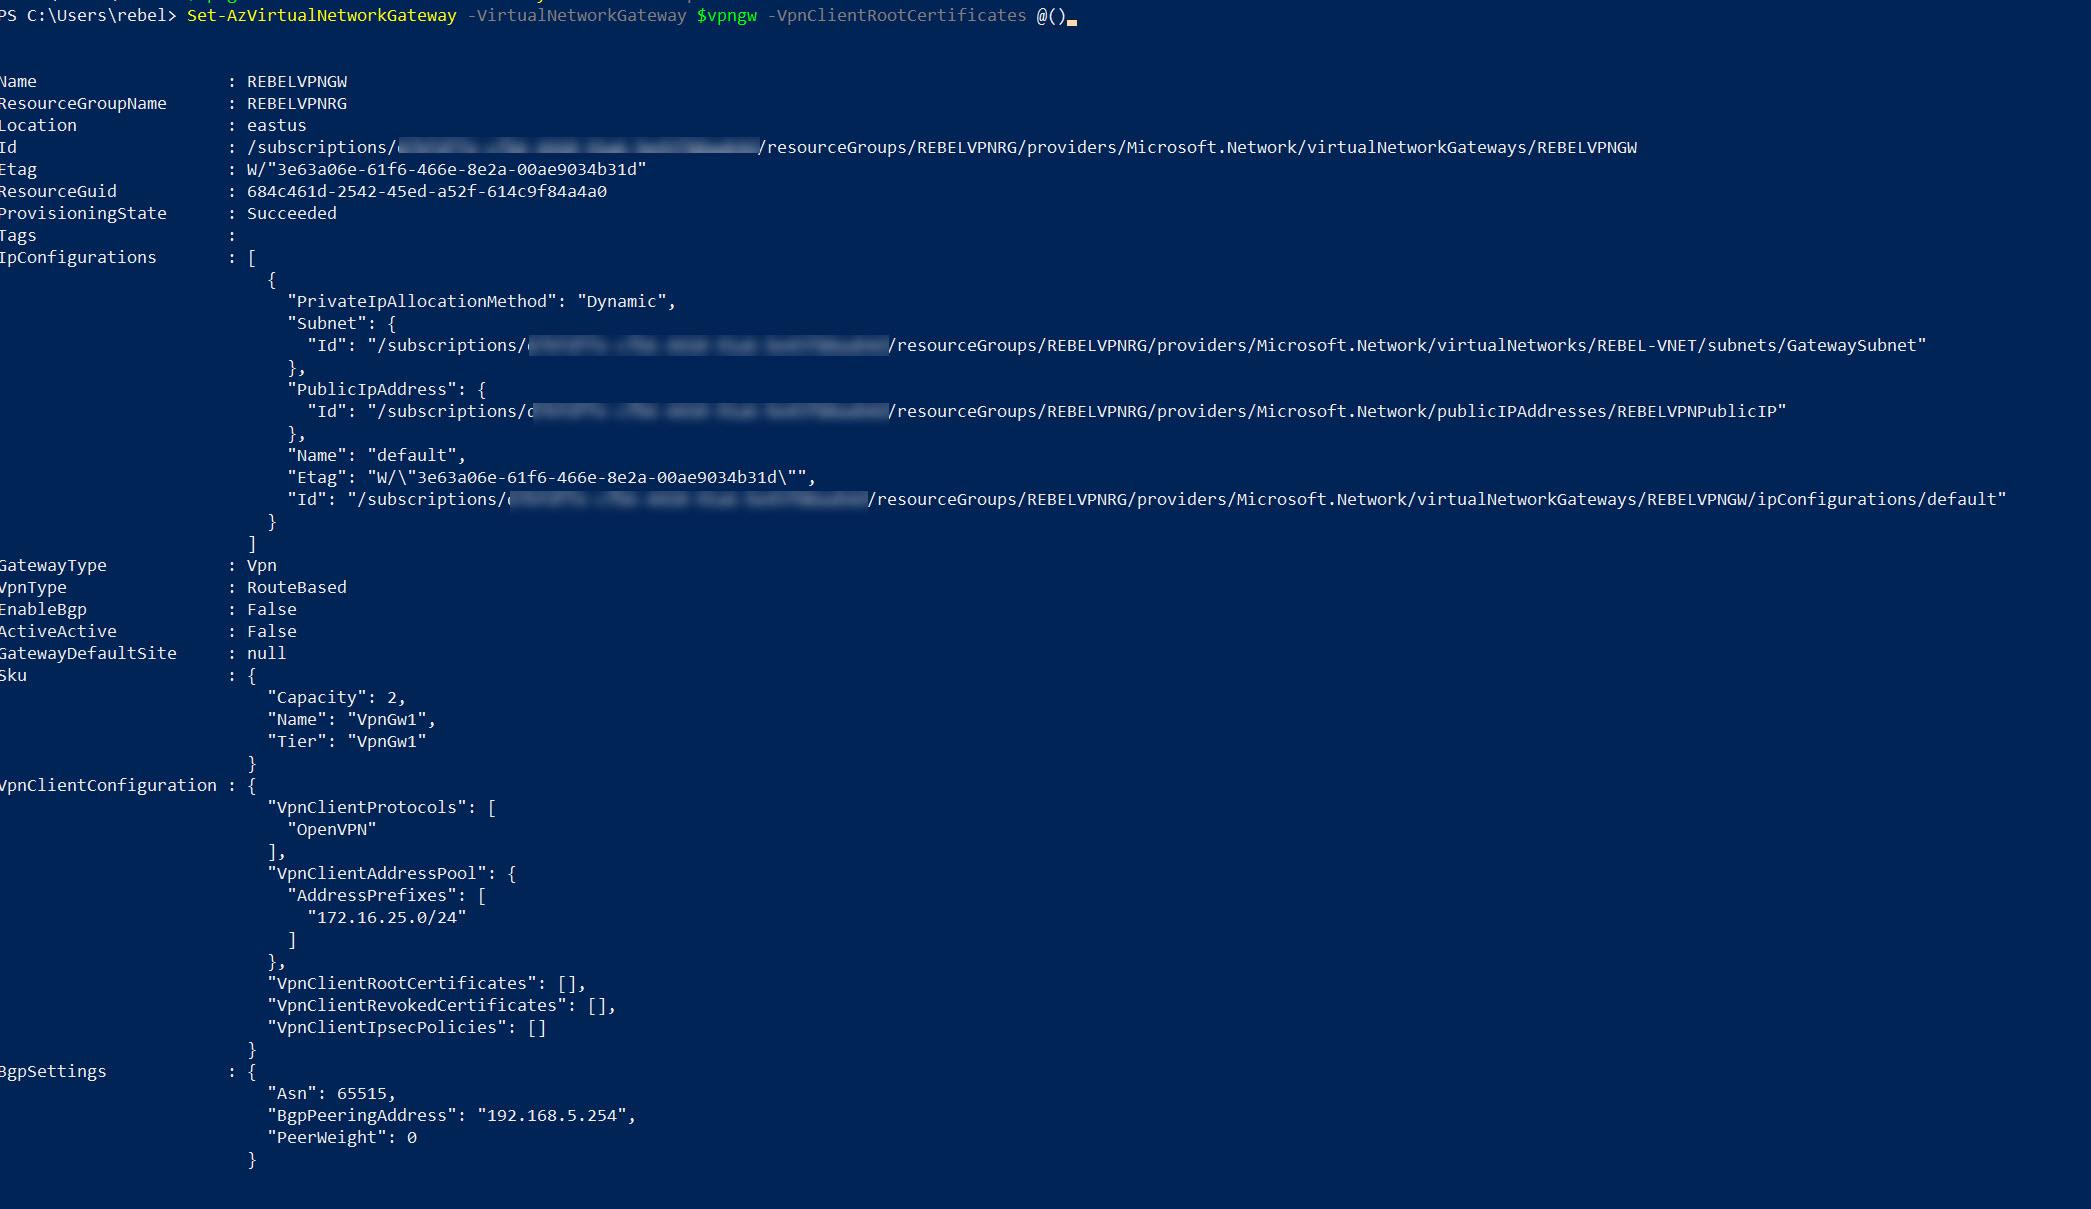 Enable Azure AD authentication for Azure VPN Gateway